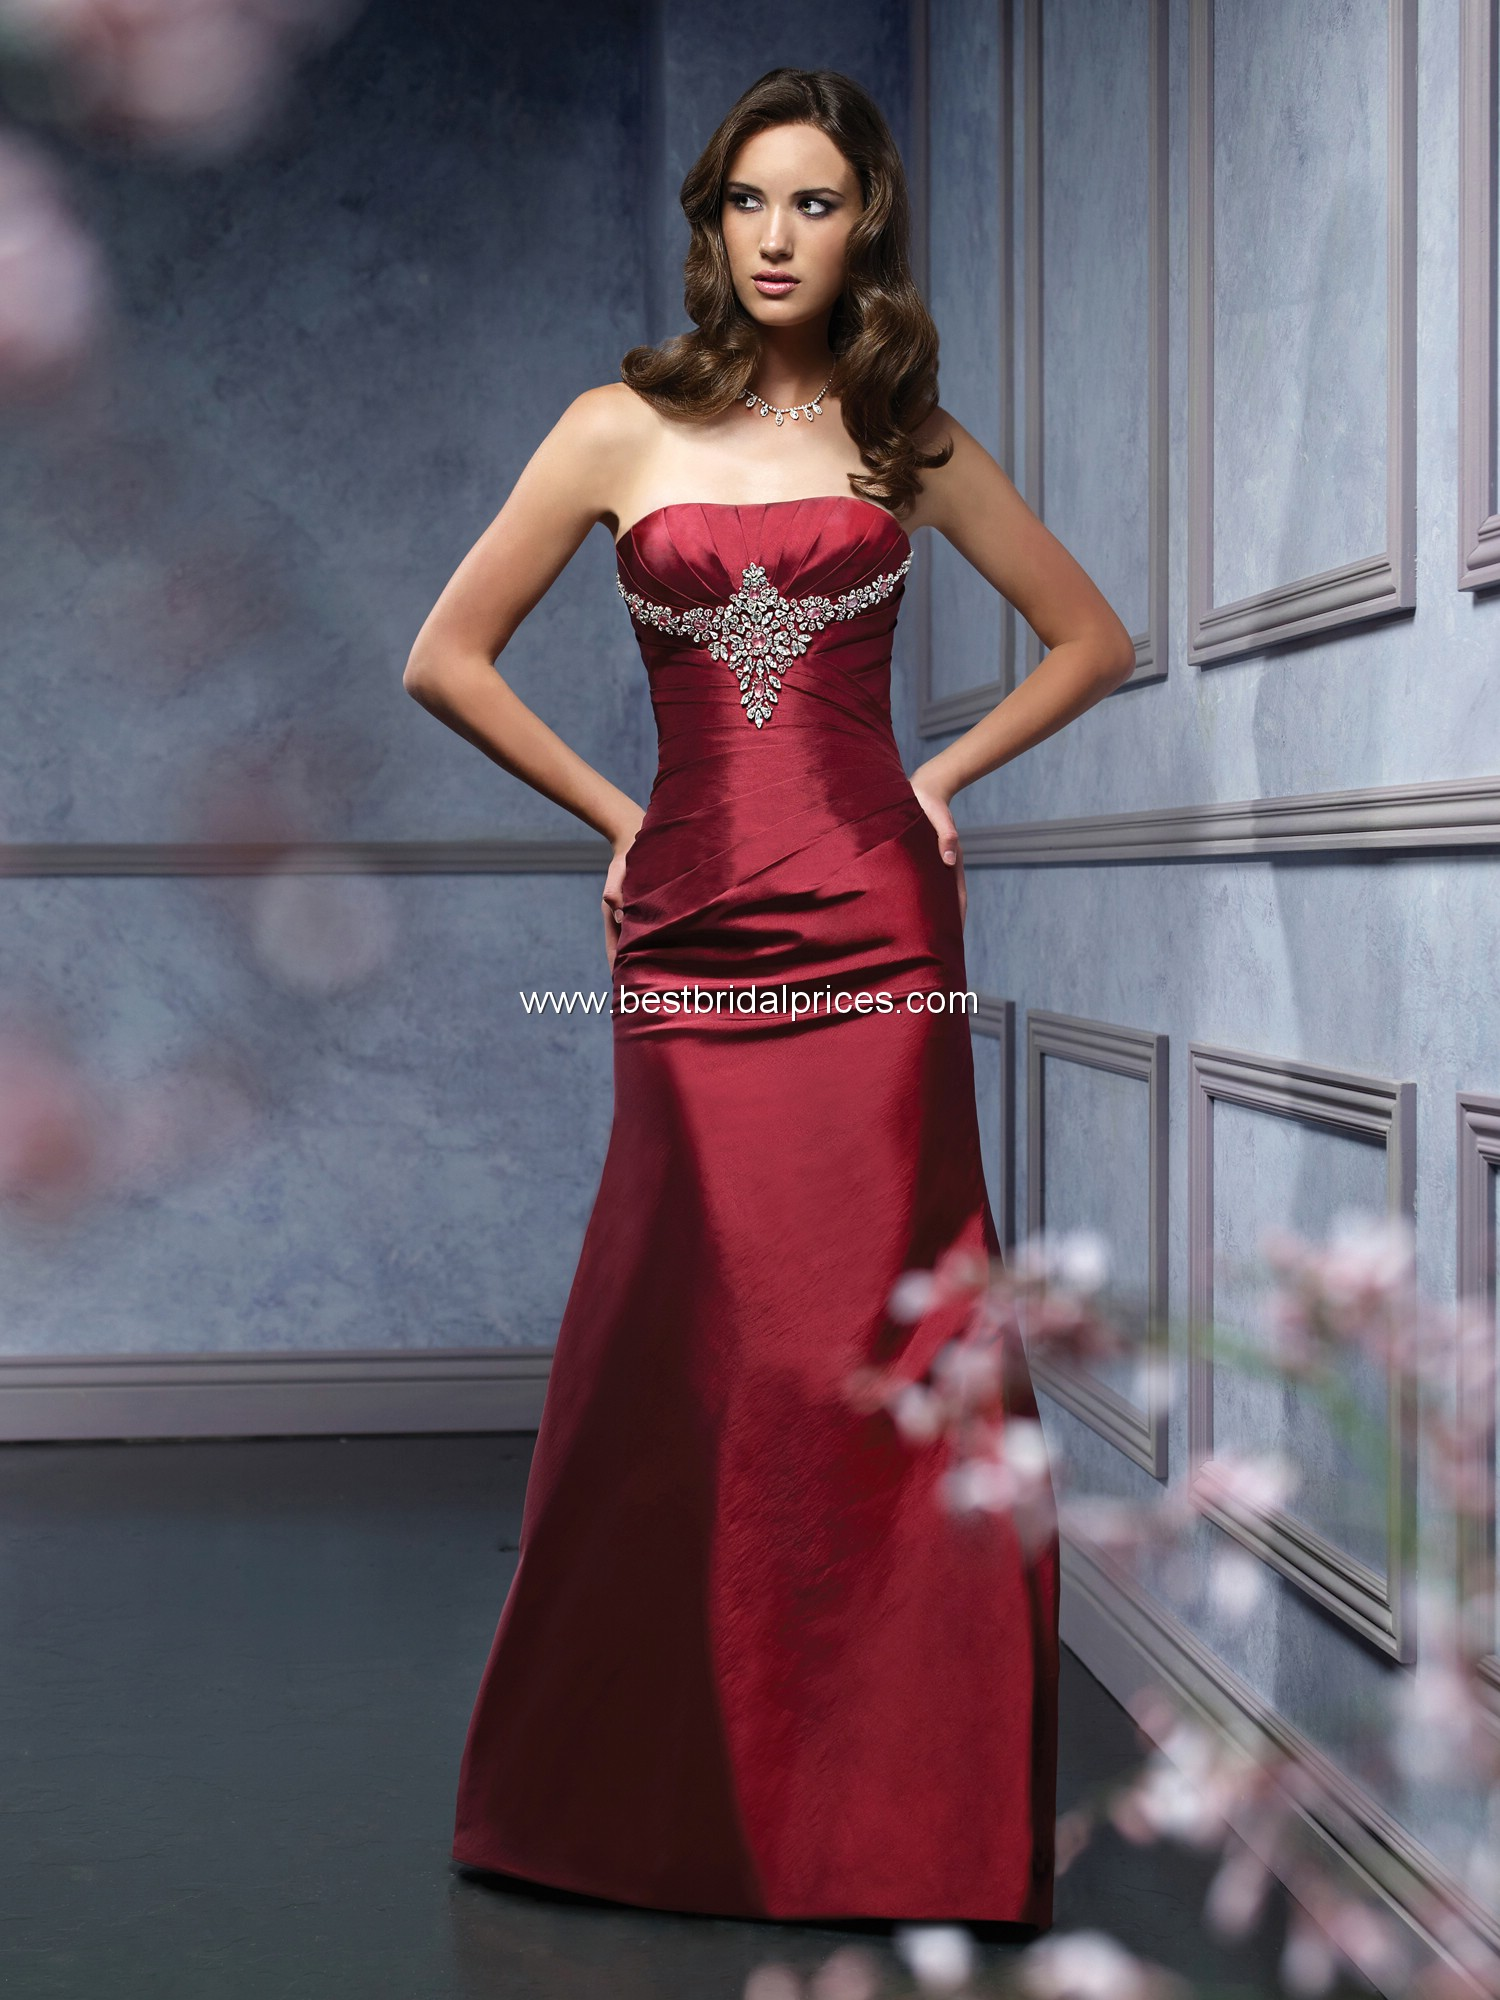 mia wedding dresses photo - 1